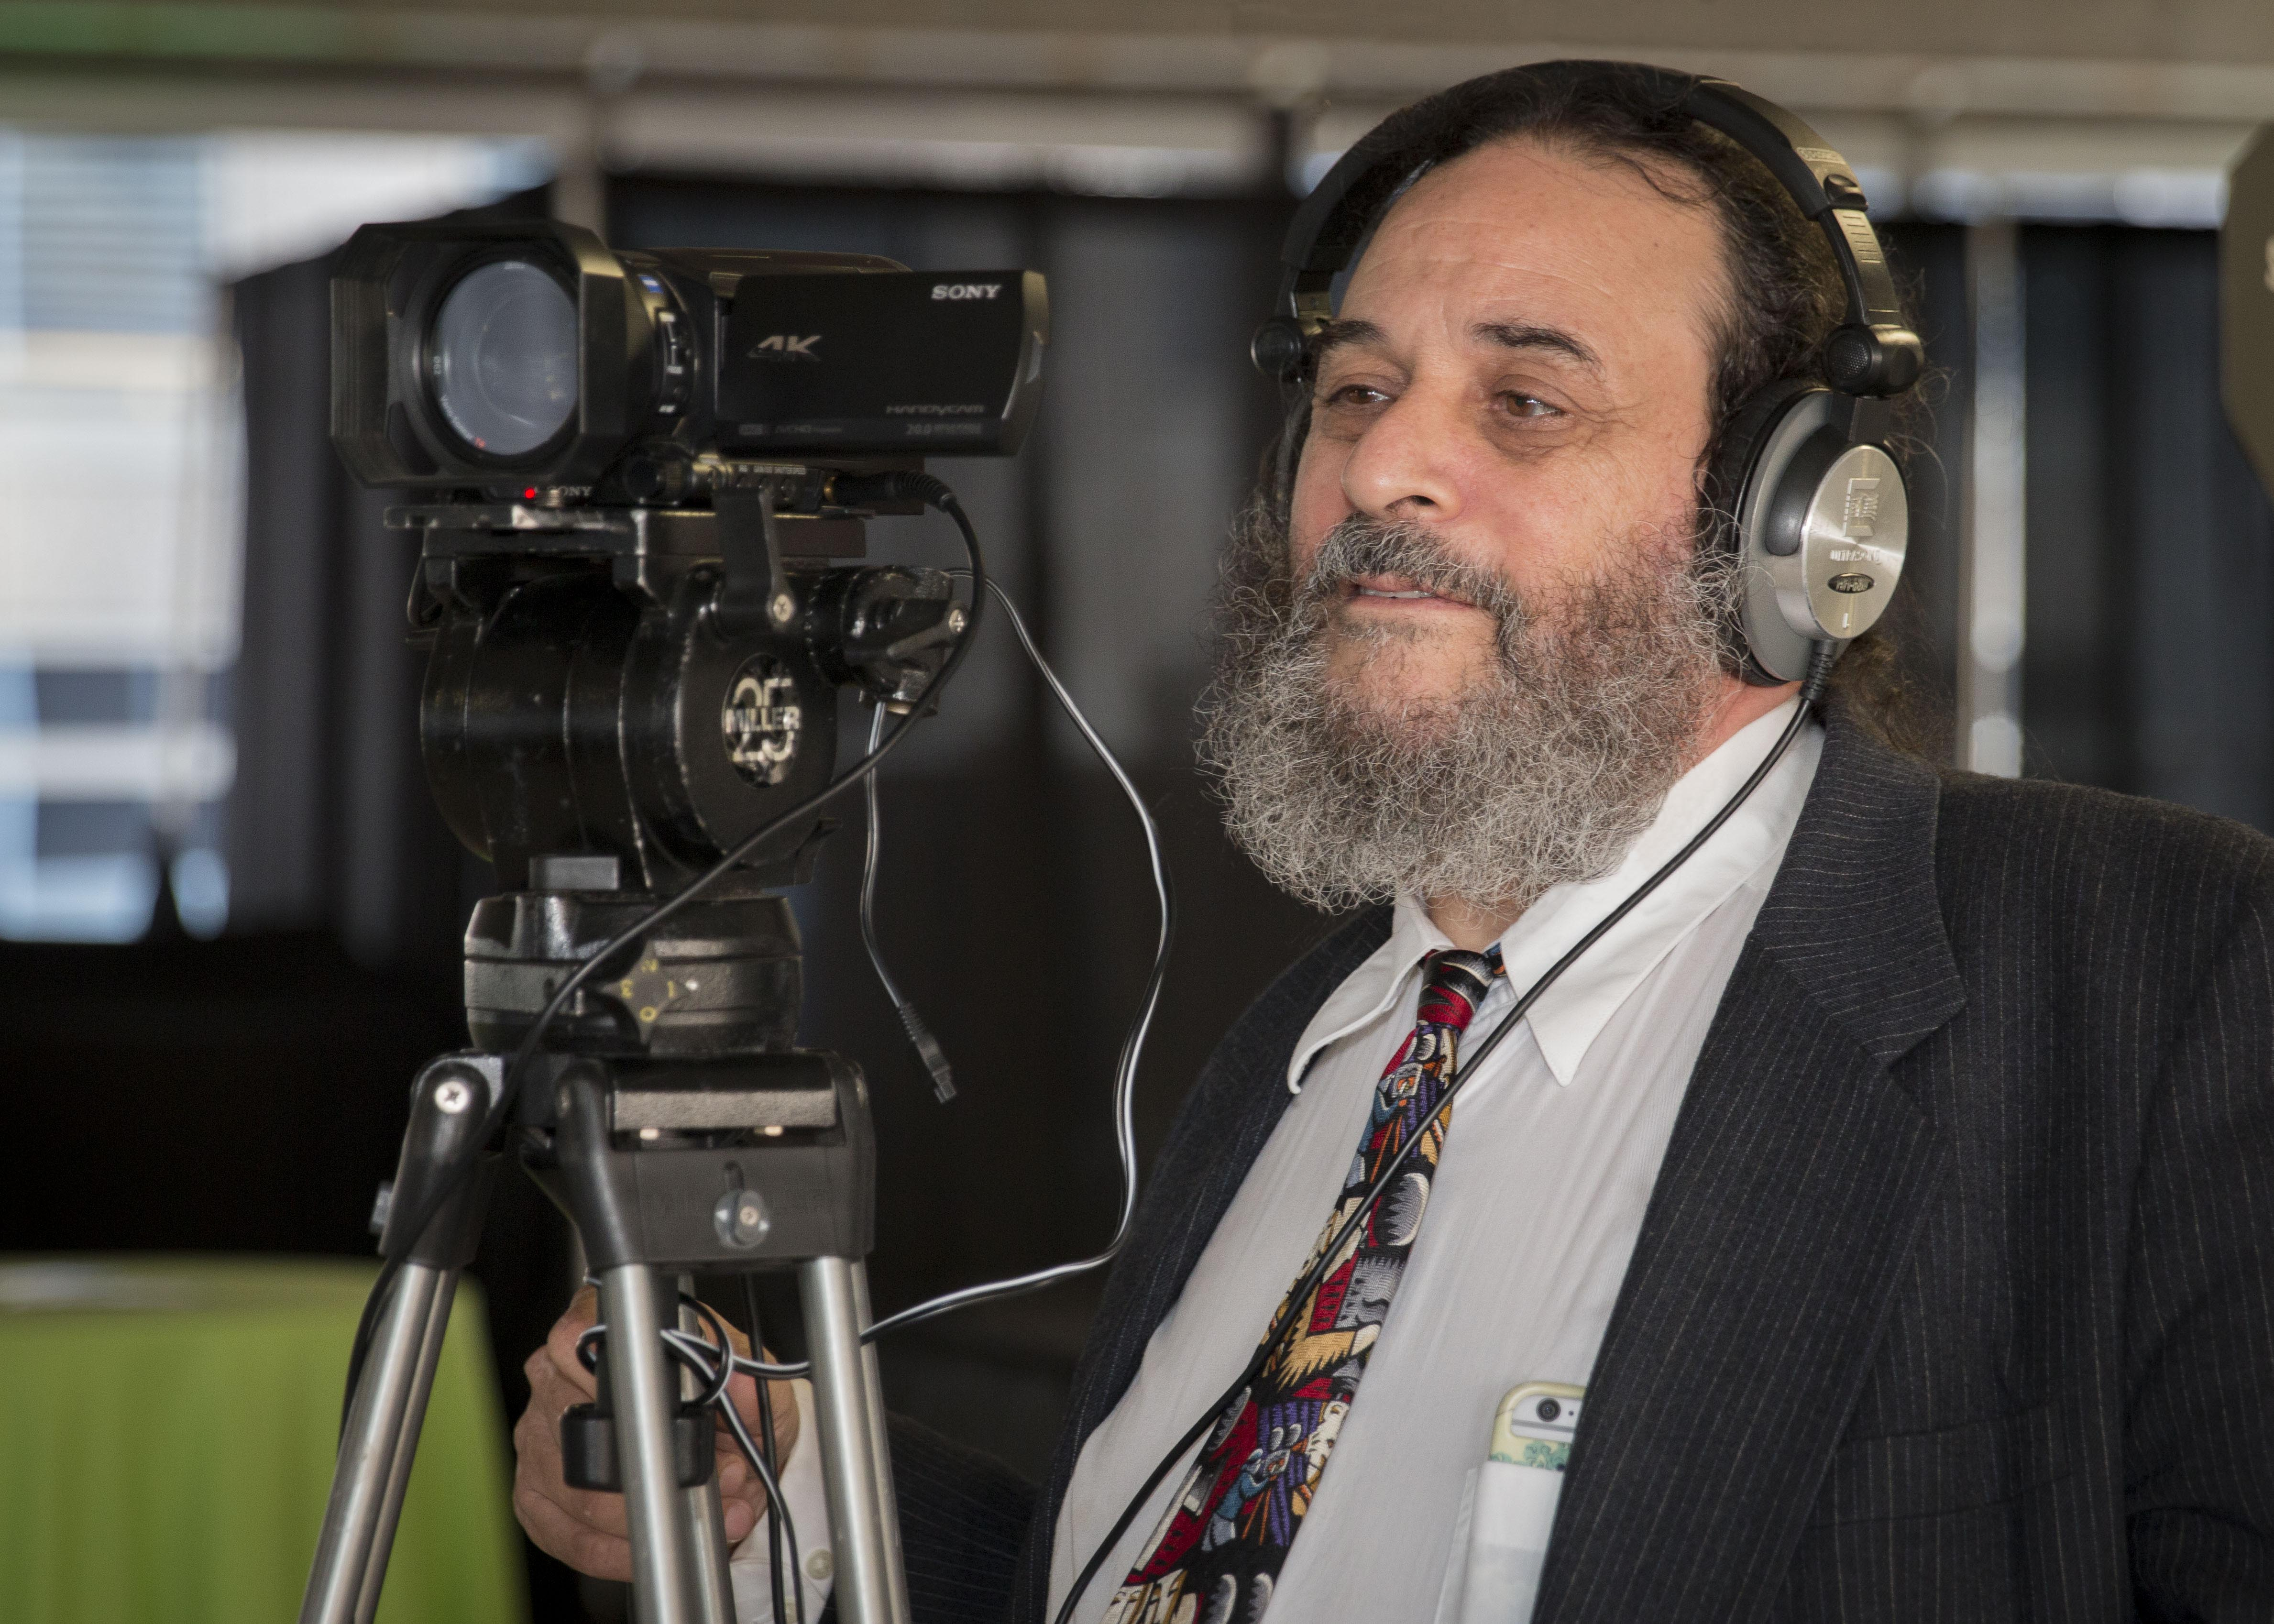 Dave Karp - Videographer